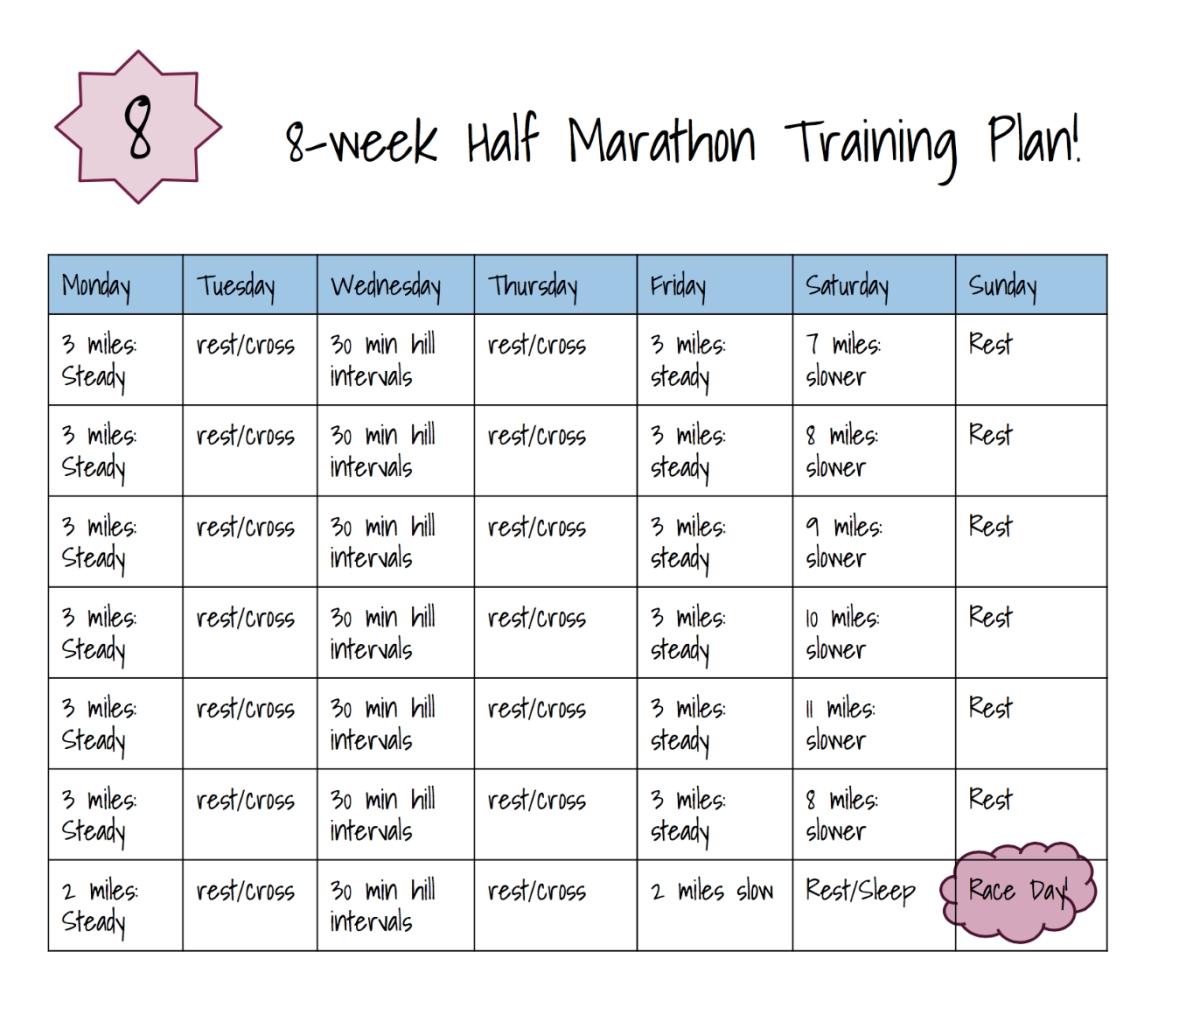 How To Do A 8-Week Half Marathon Training Program | Half